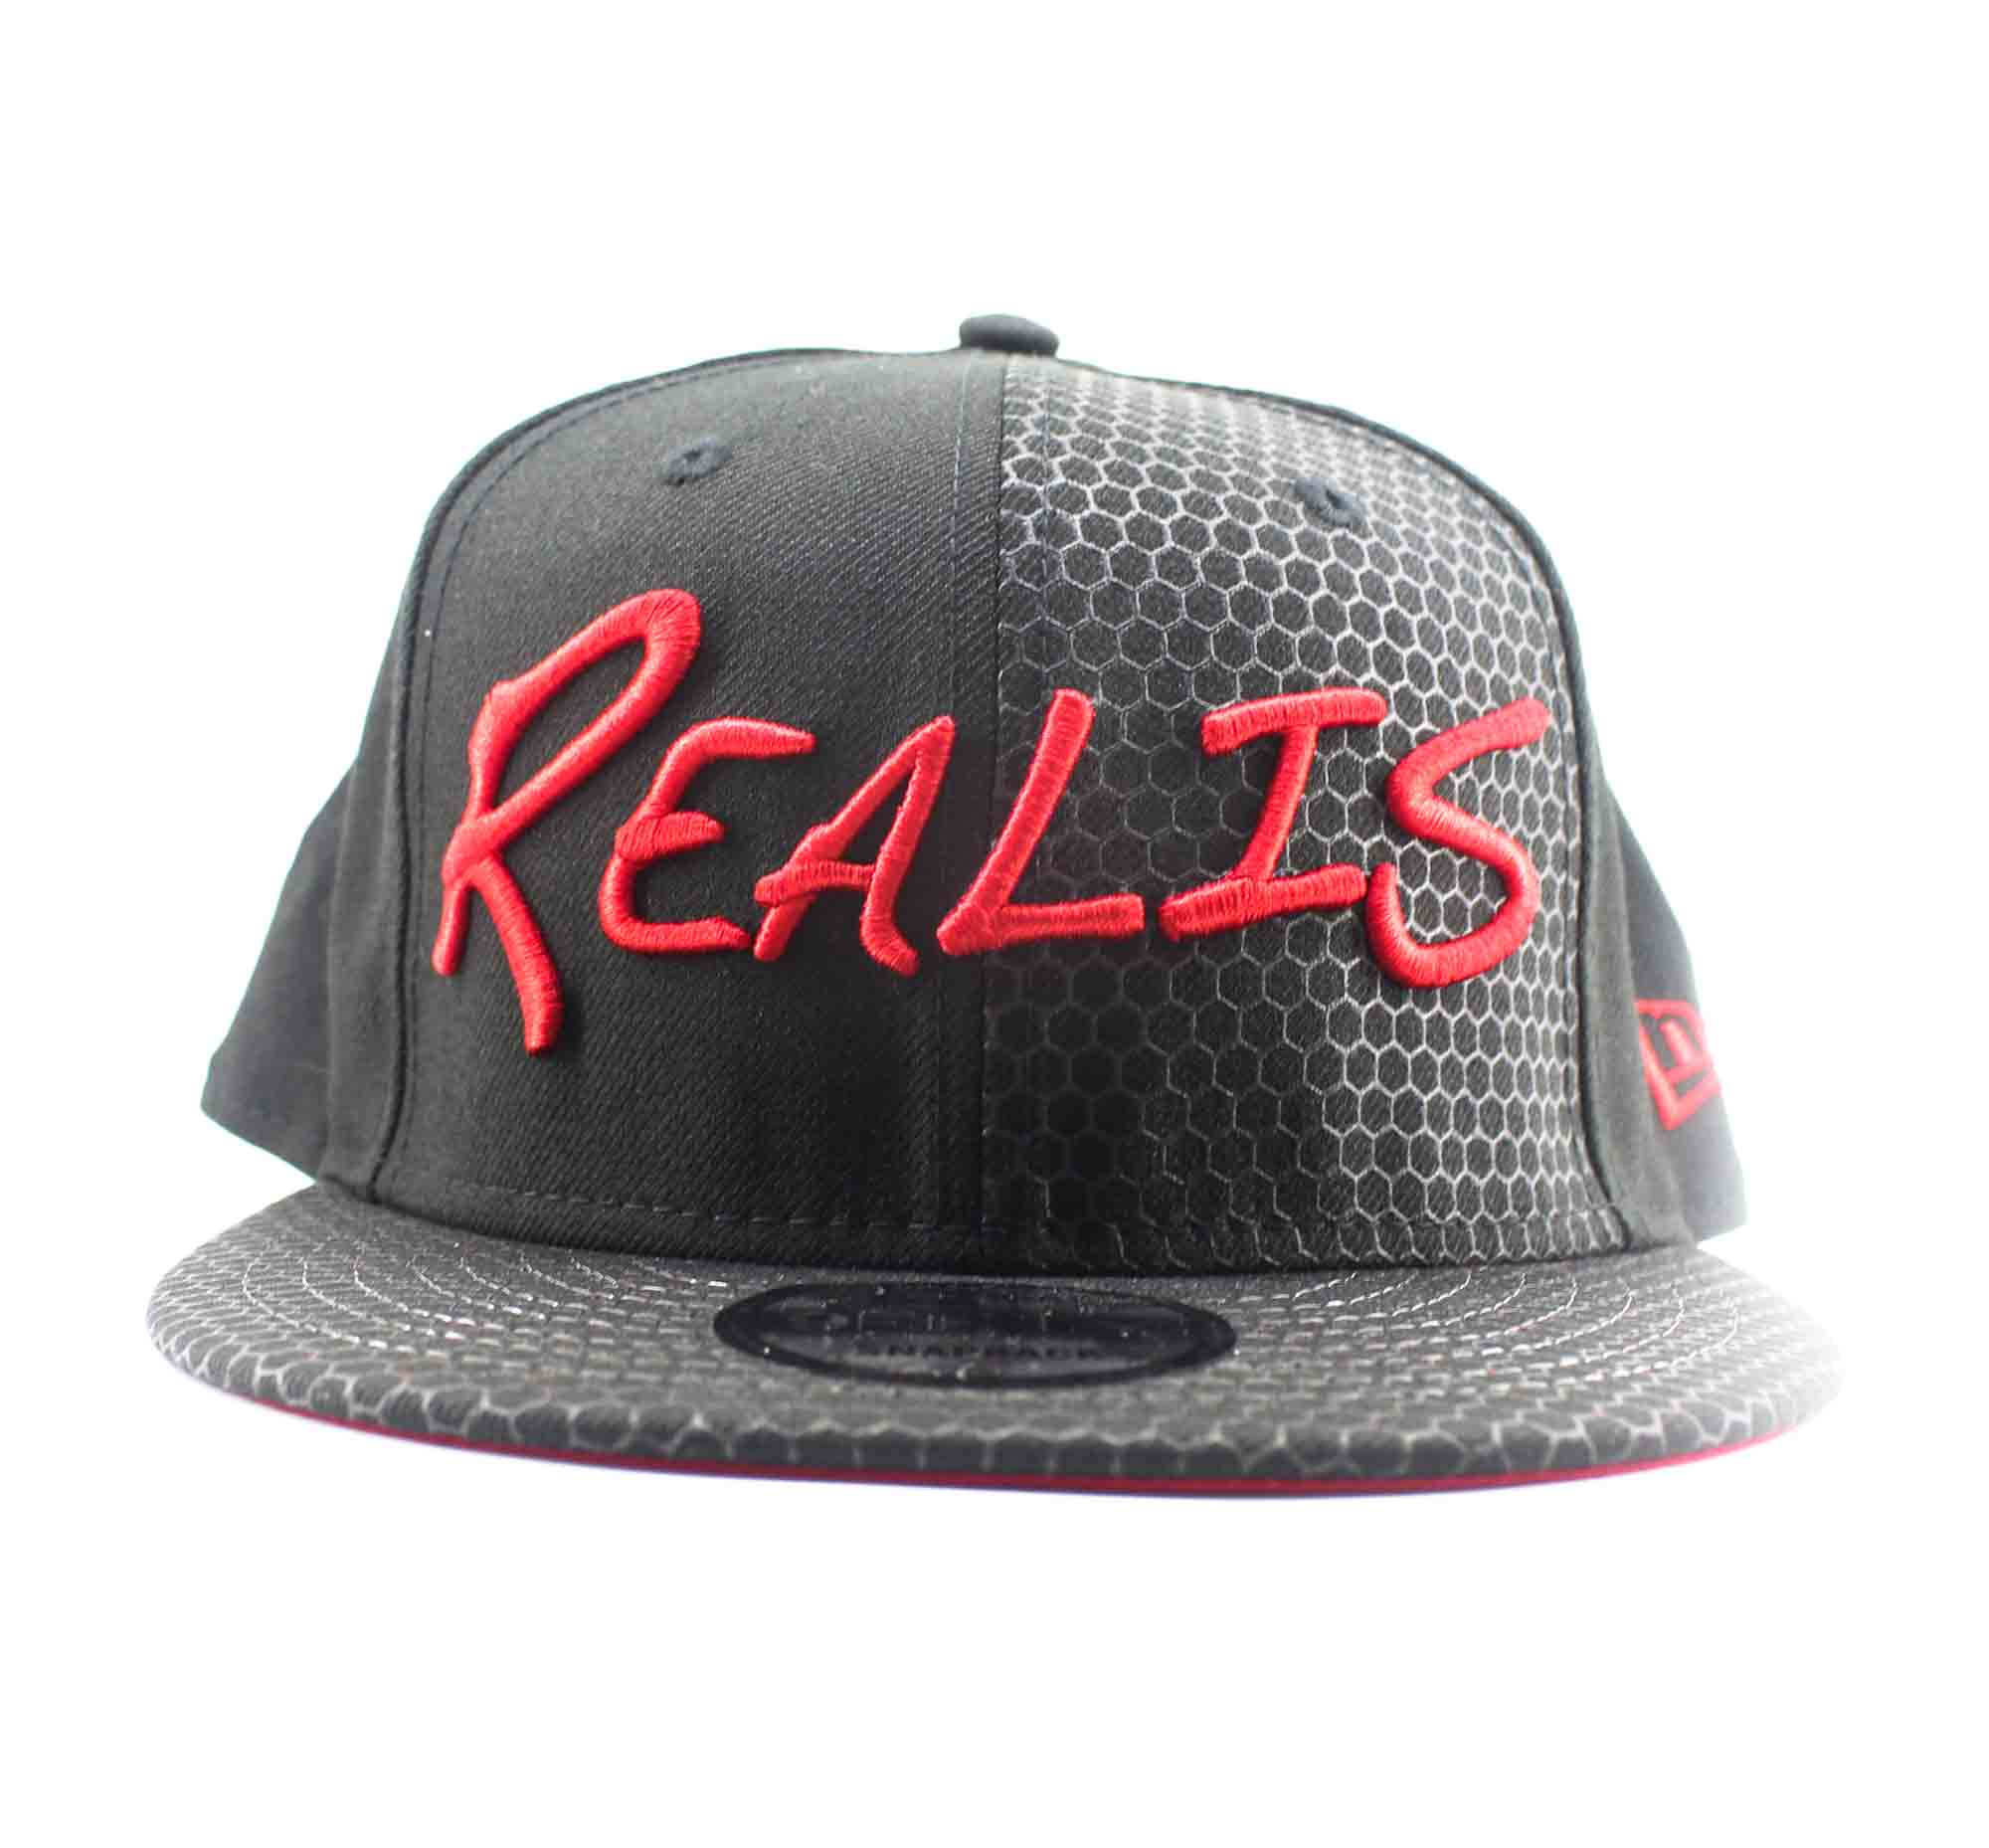 Duo Cap New Era x Realis Cap Free Size Black Red (4649)